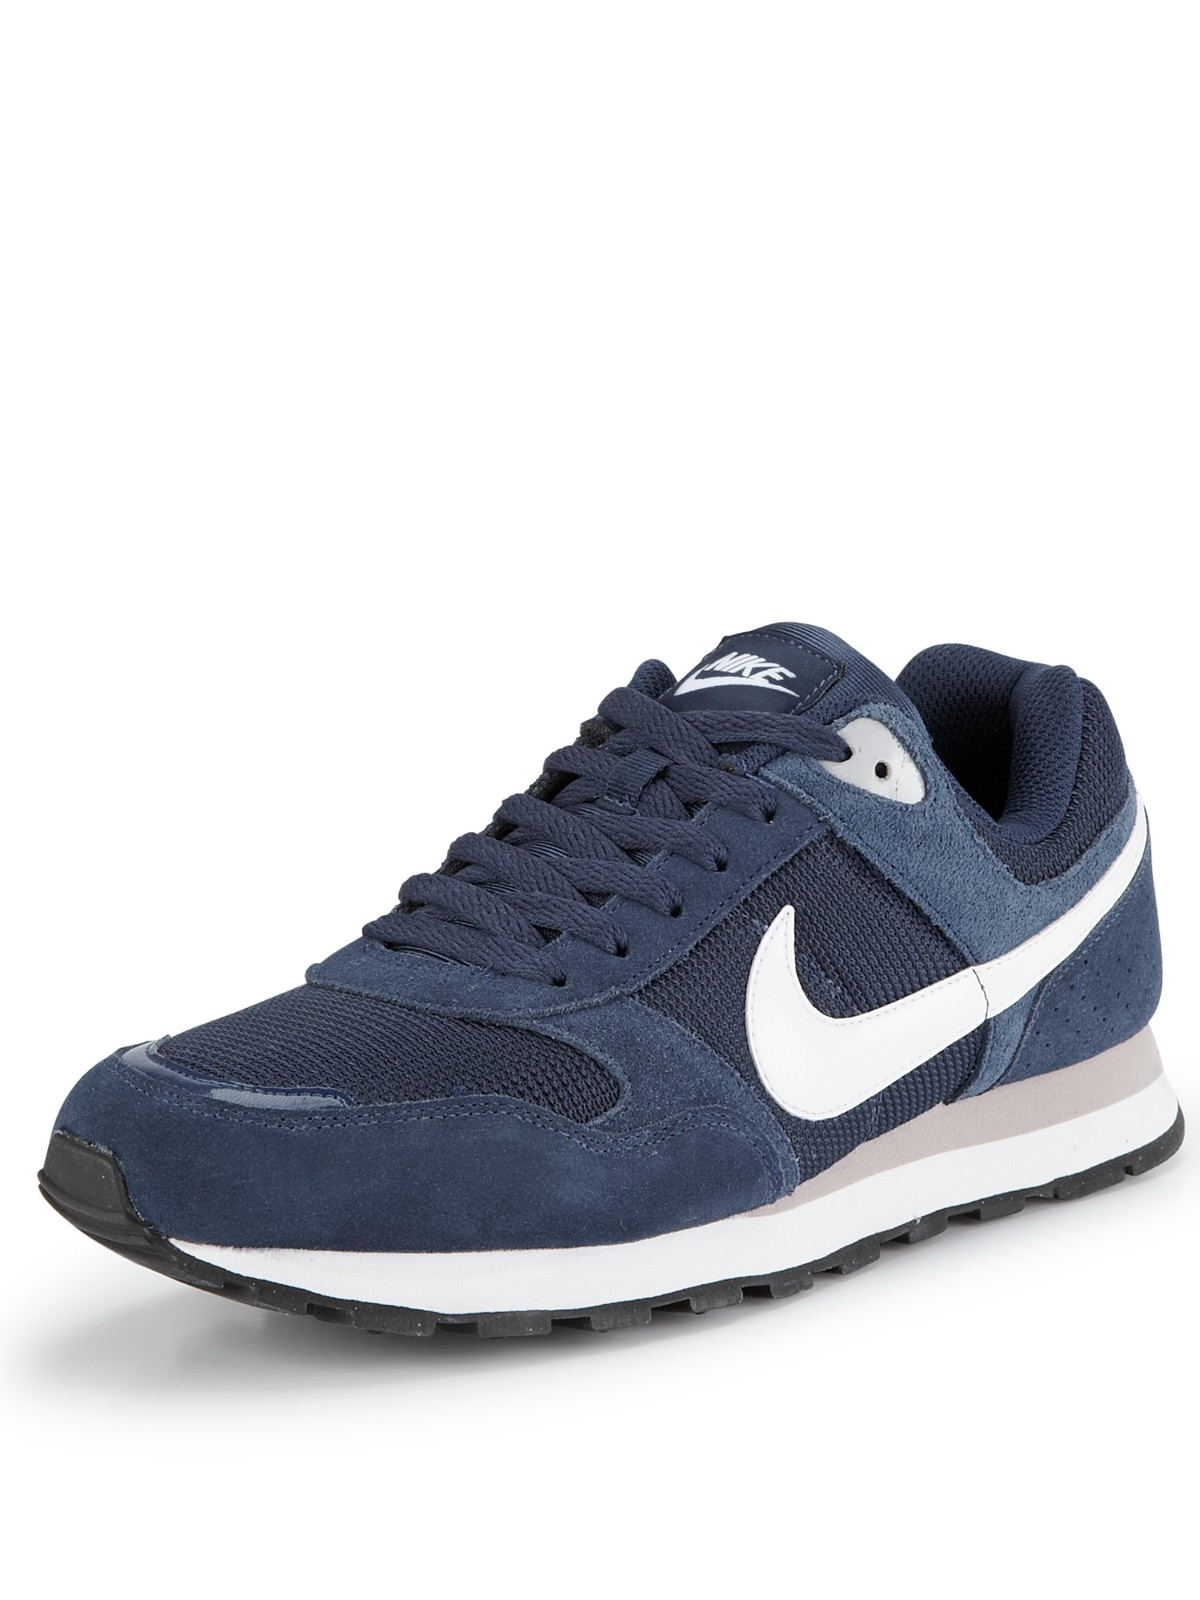 nike nike md runner mens trainers in blue for men navy grey white lyst. Black Bedroom Furniture Sets. Home Design Ideas